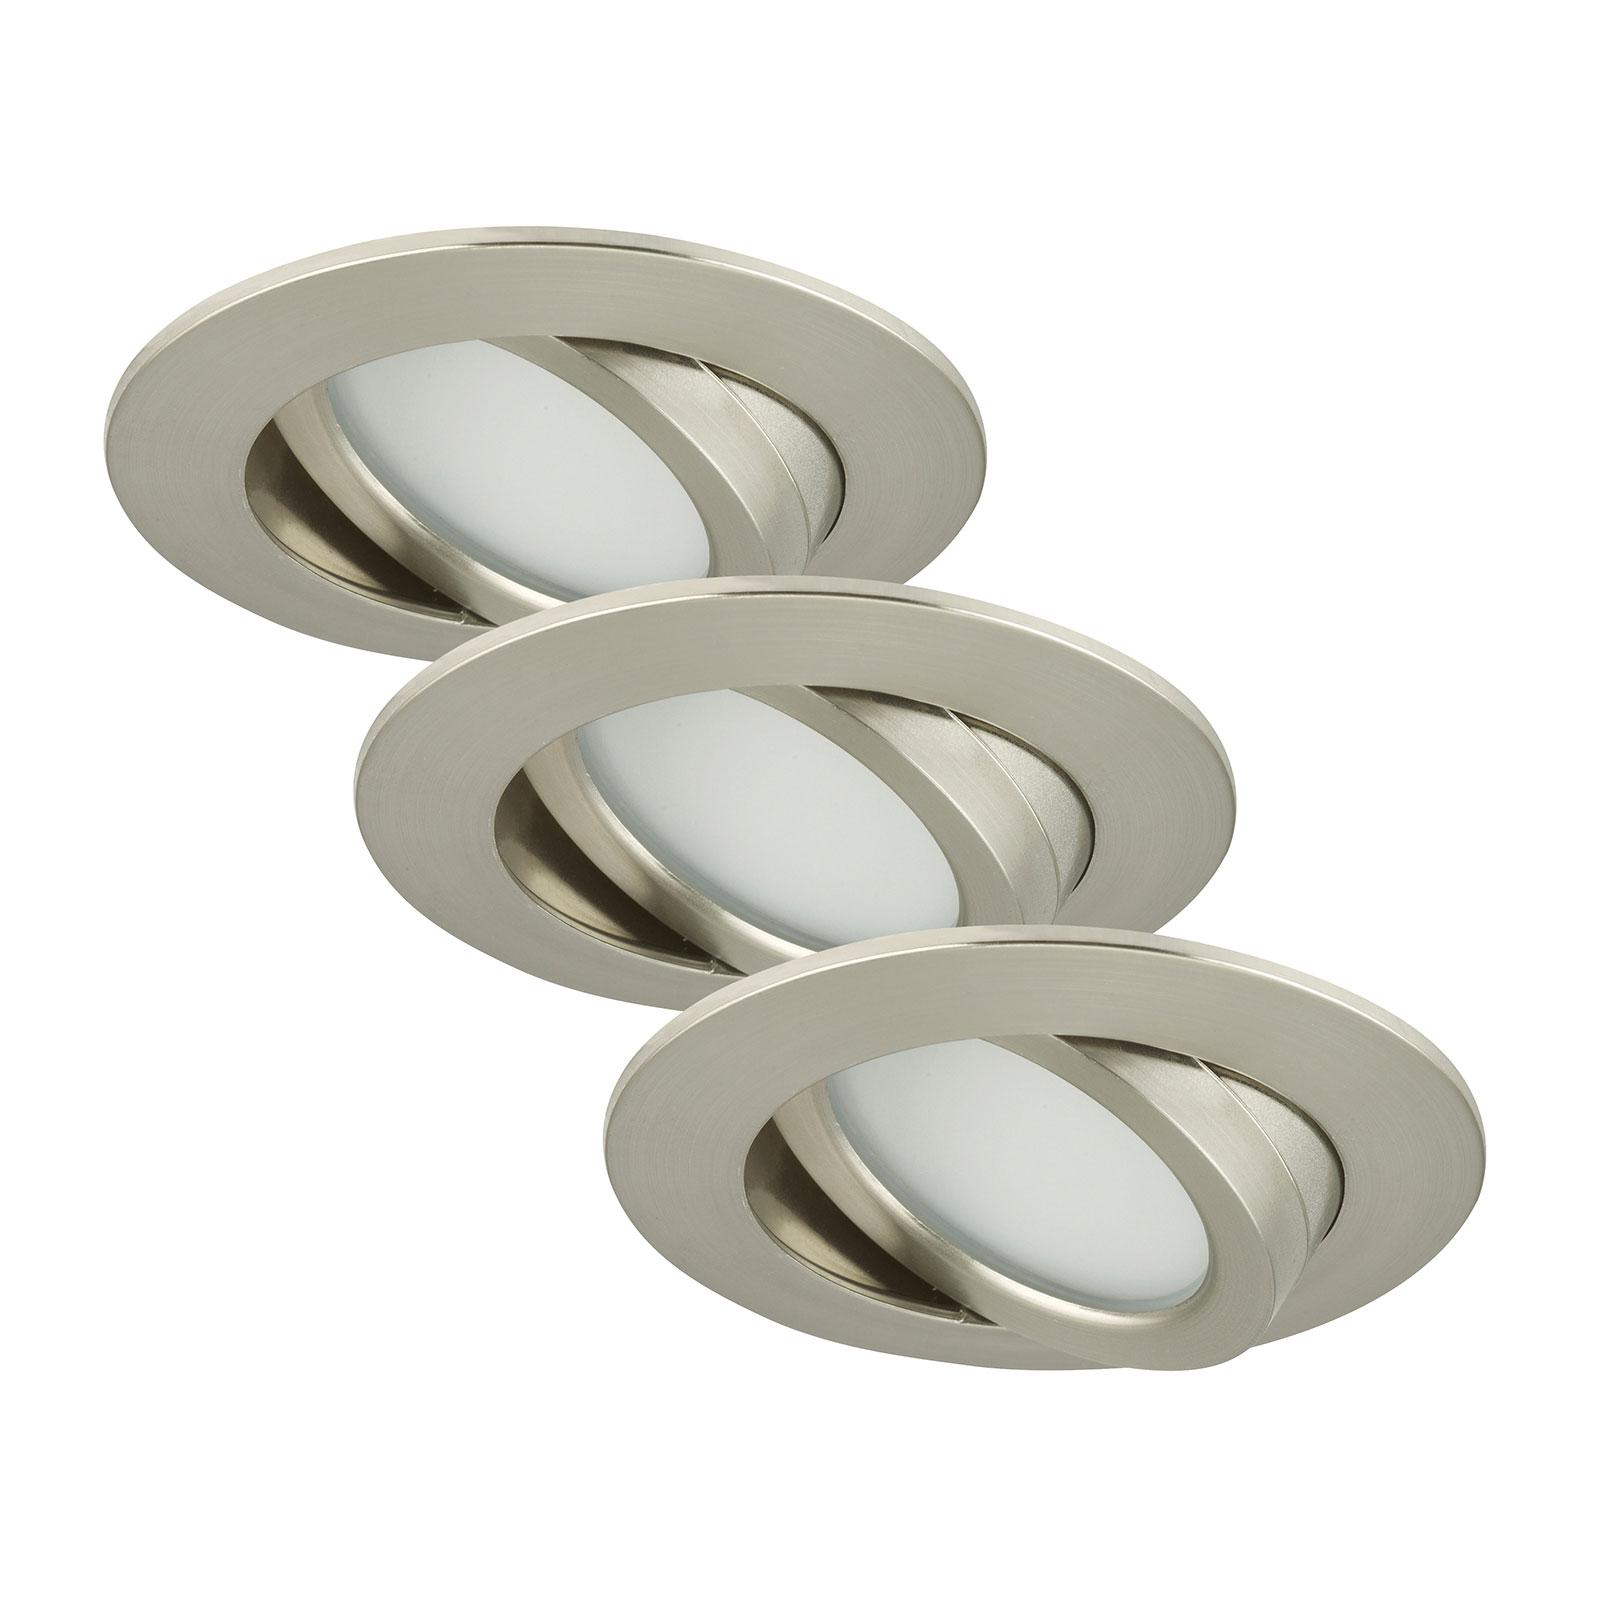 Draaibare LED inbouwlamp Bert, nikkel, 3 per set